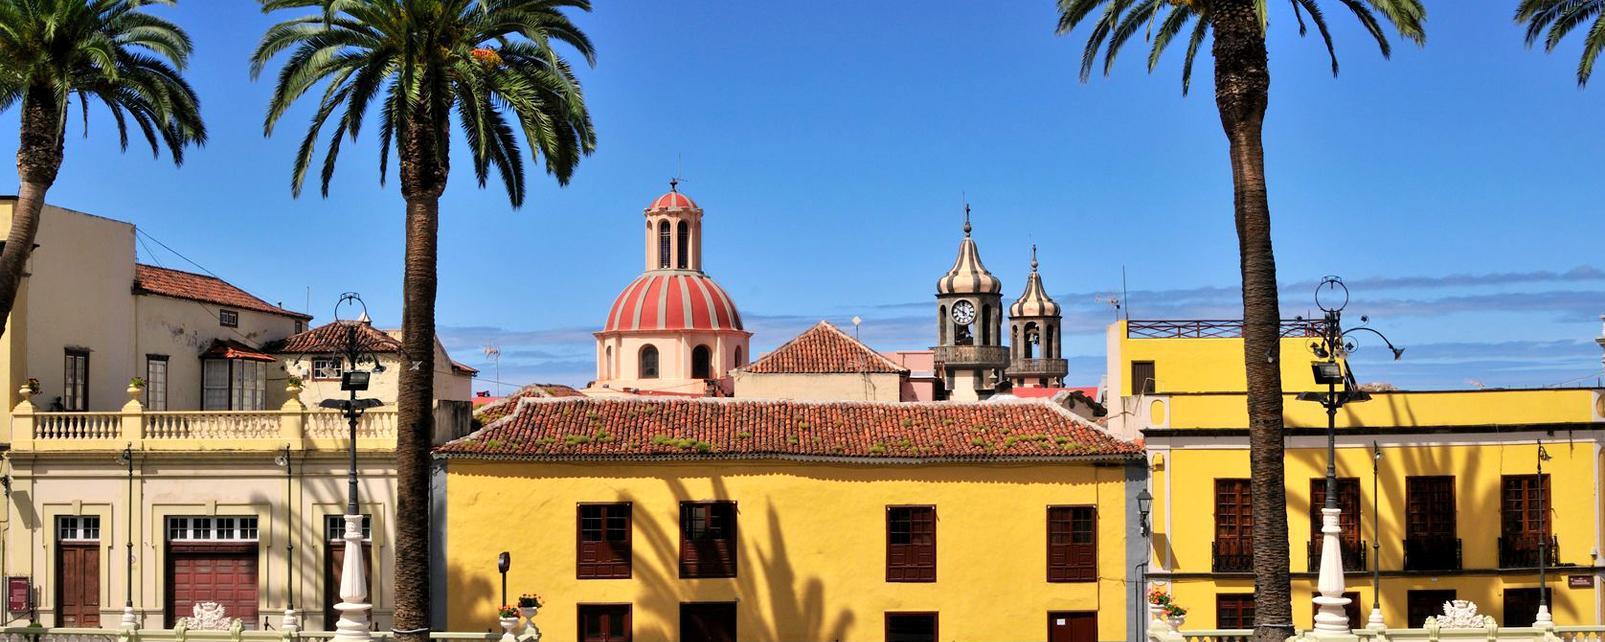 Viajes a la orotava espa a gu a de viajes la orotava - Viaje de novios espana ...